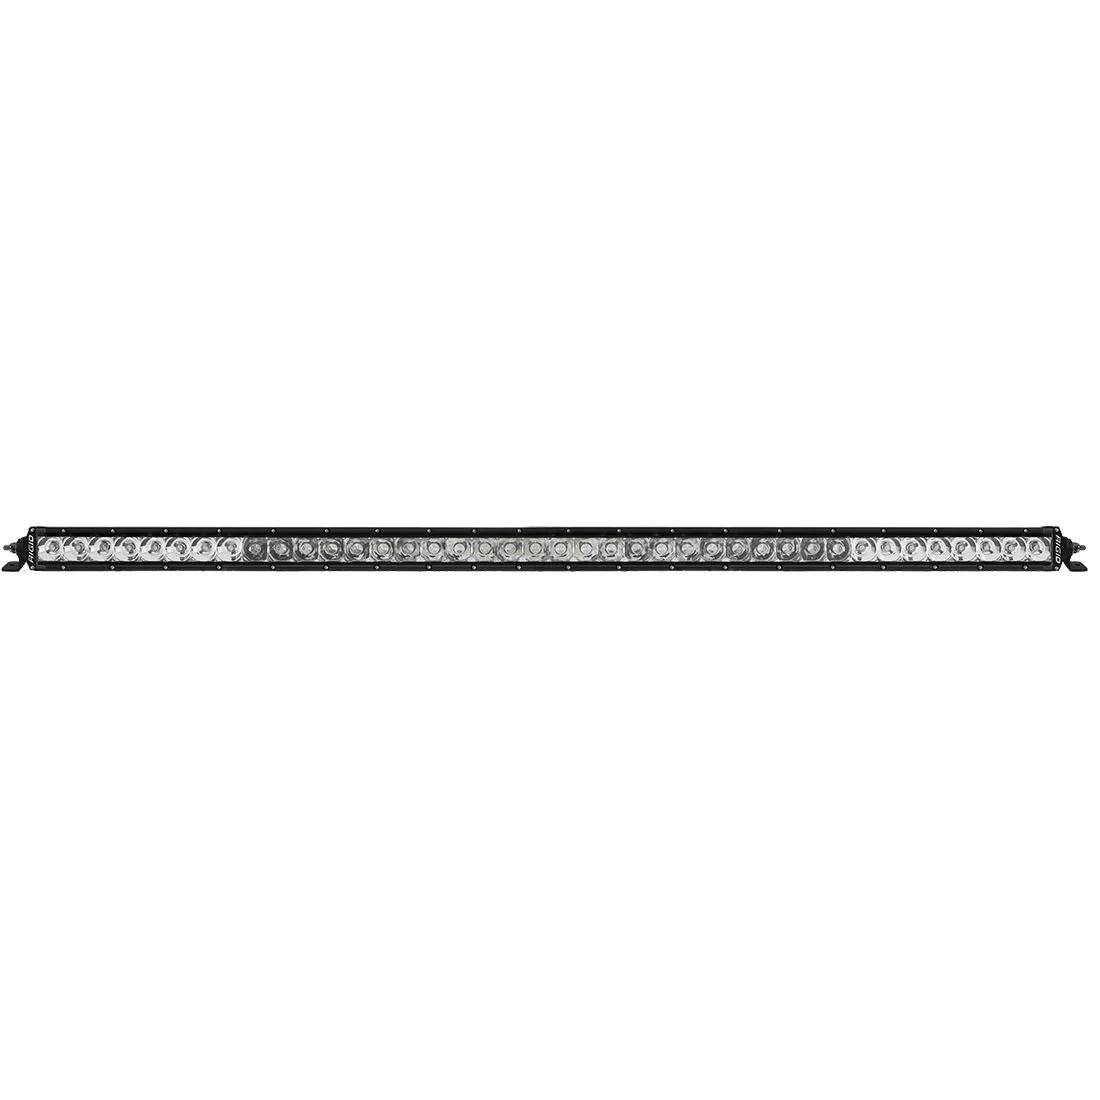 rigid industries sr series 40 led spot flood combo light bar main line overland [ 1100 x 1100 Pixel ]